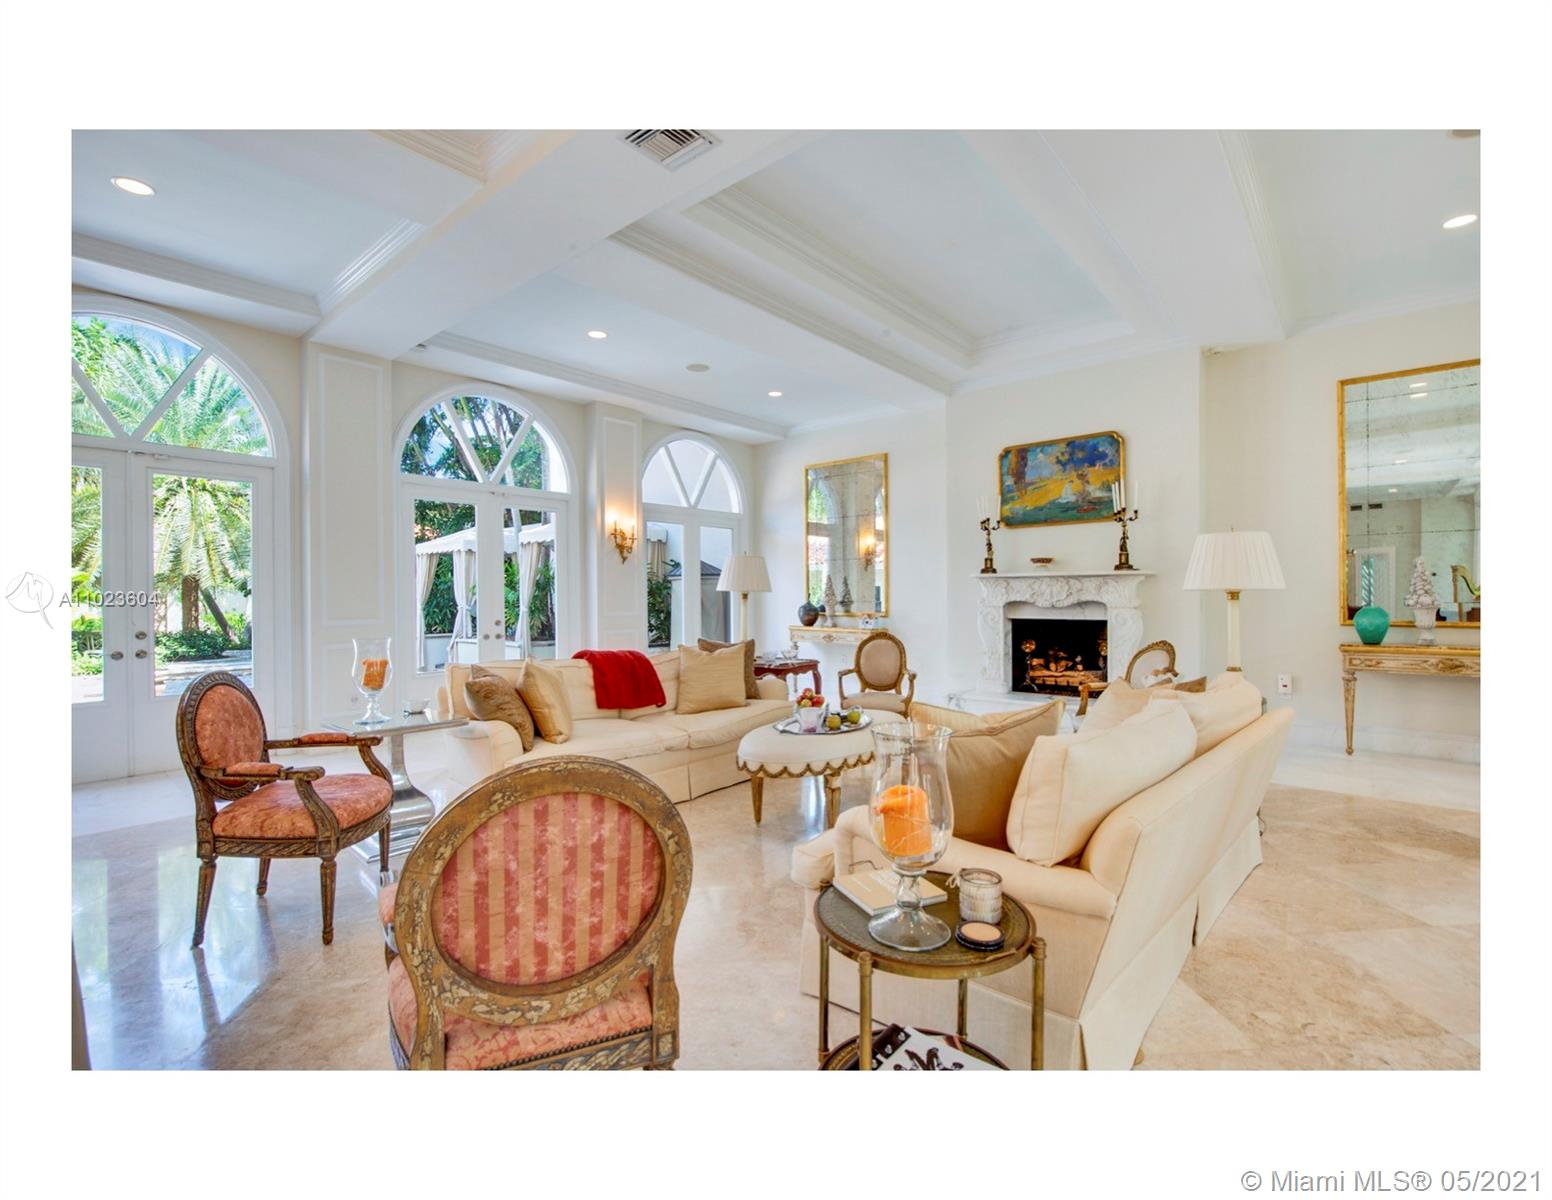 2461- Fka S Bayshore Drive Luxury Real Estate